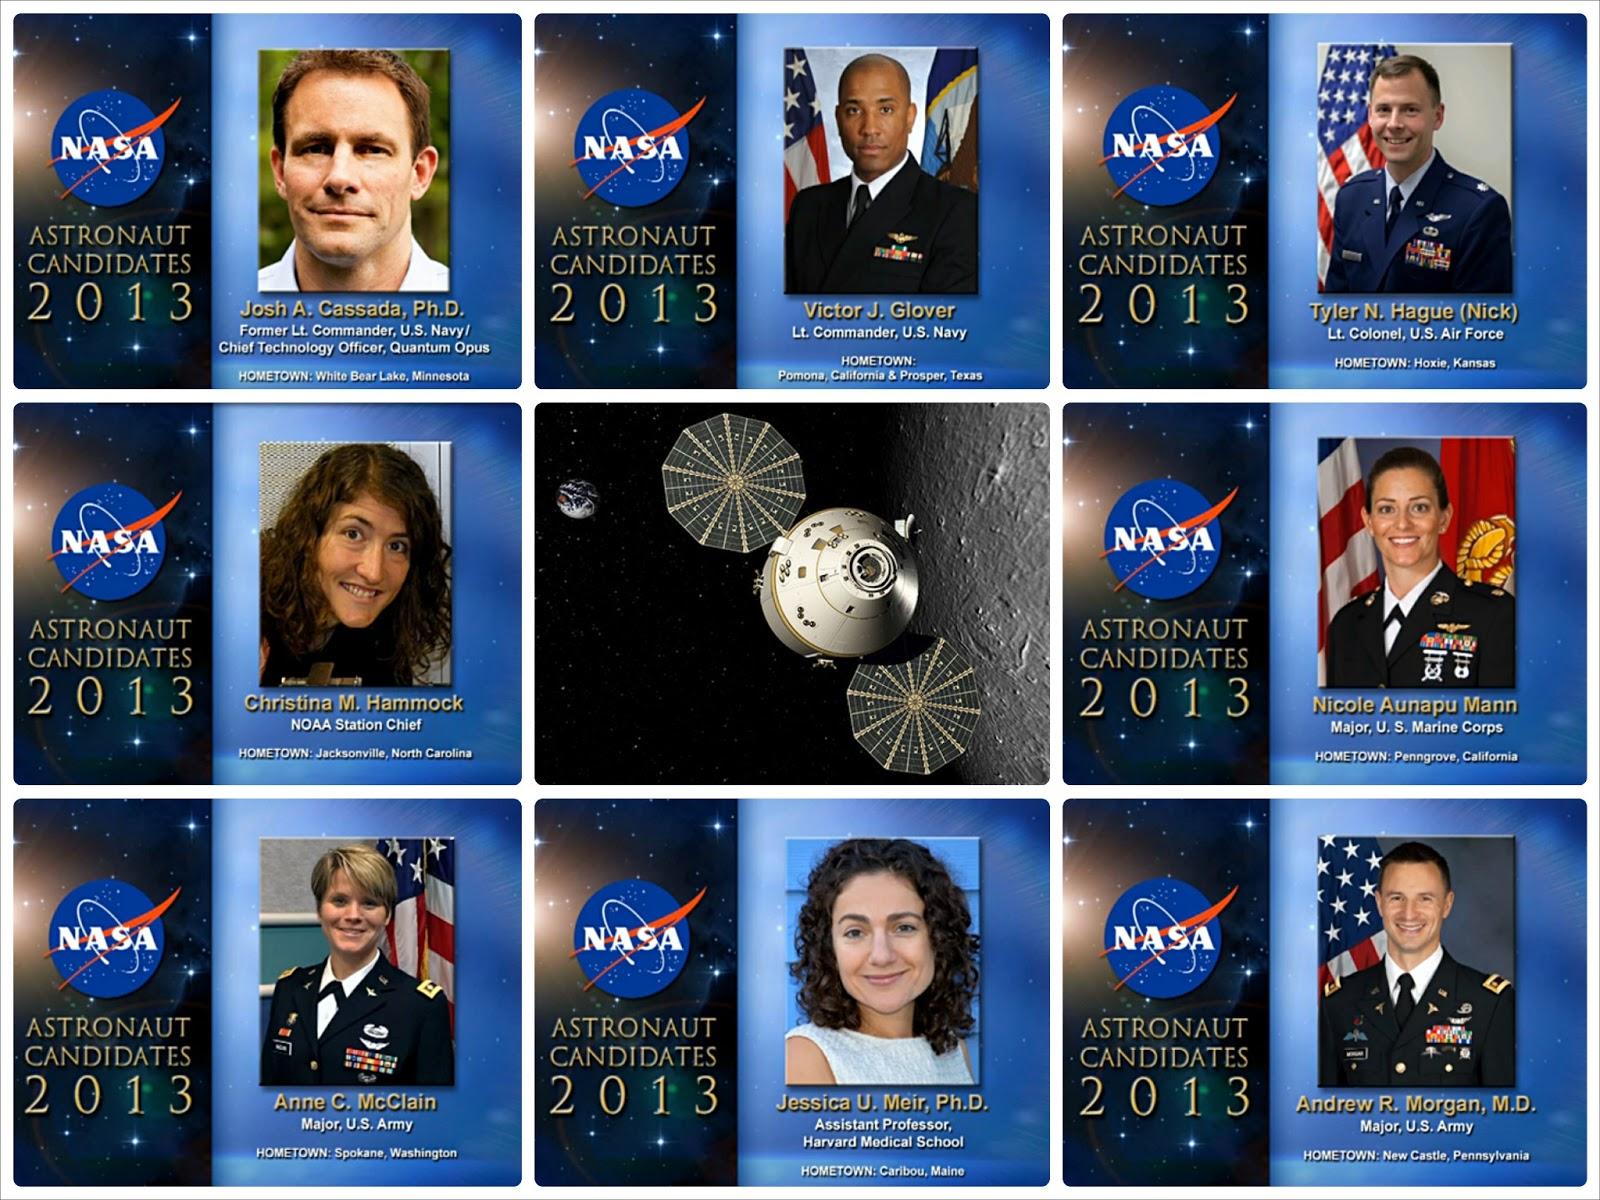 astronaut corps - photo #38